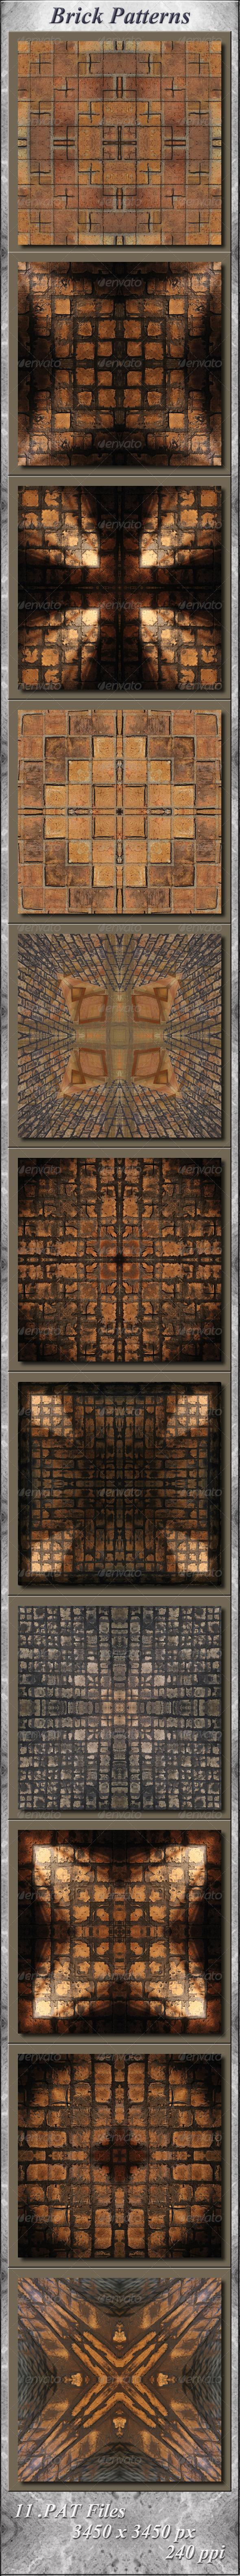 GraphicRiver Brick Patterns 5668813